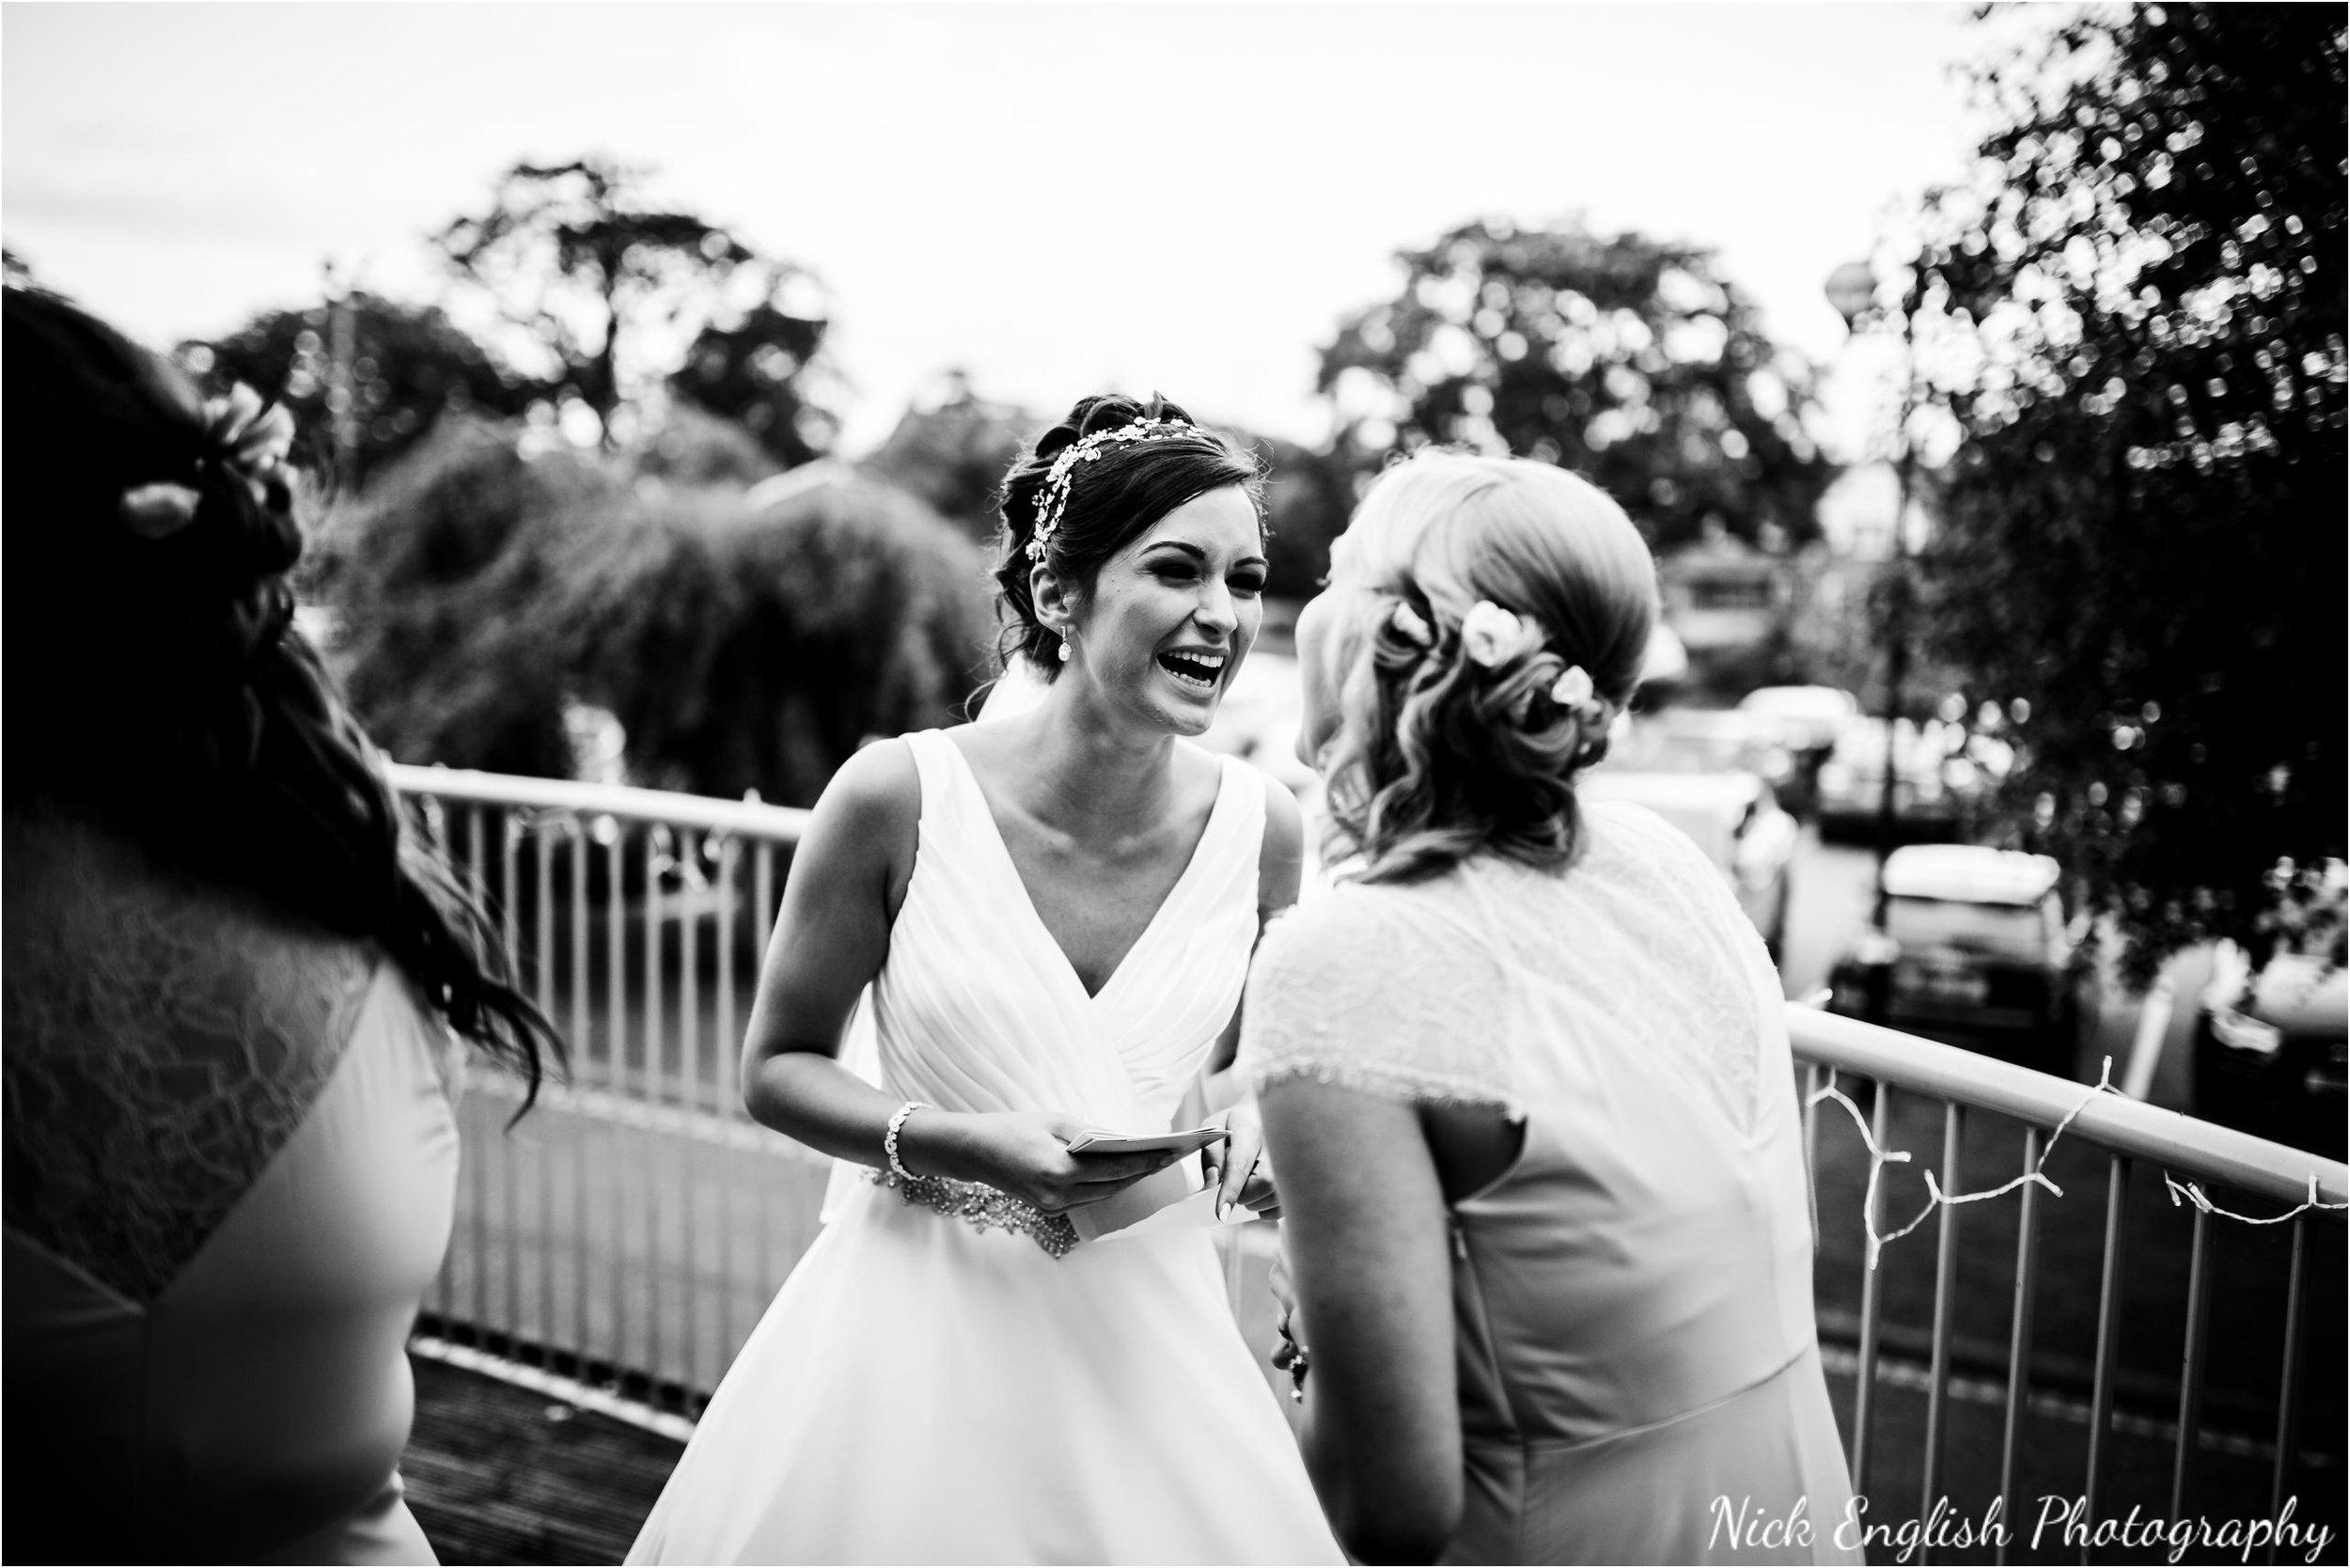 Emily David Wedding Photographs at Barton Grange Preston by Nick English Photography 211jpg.jpeg